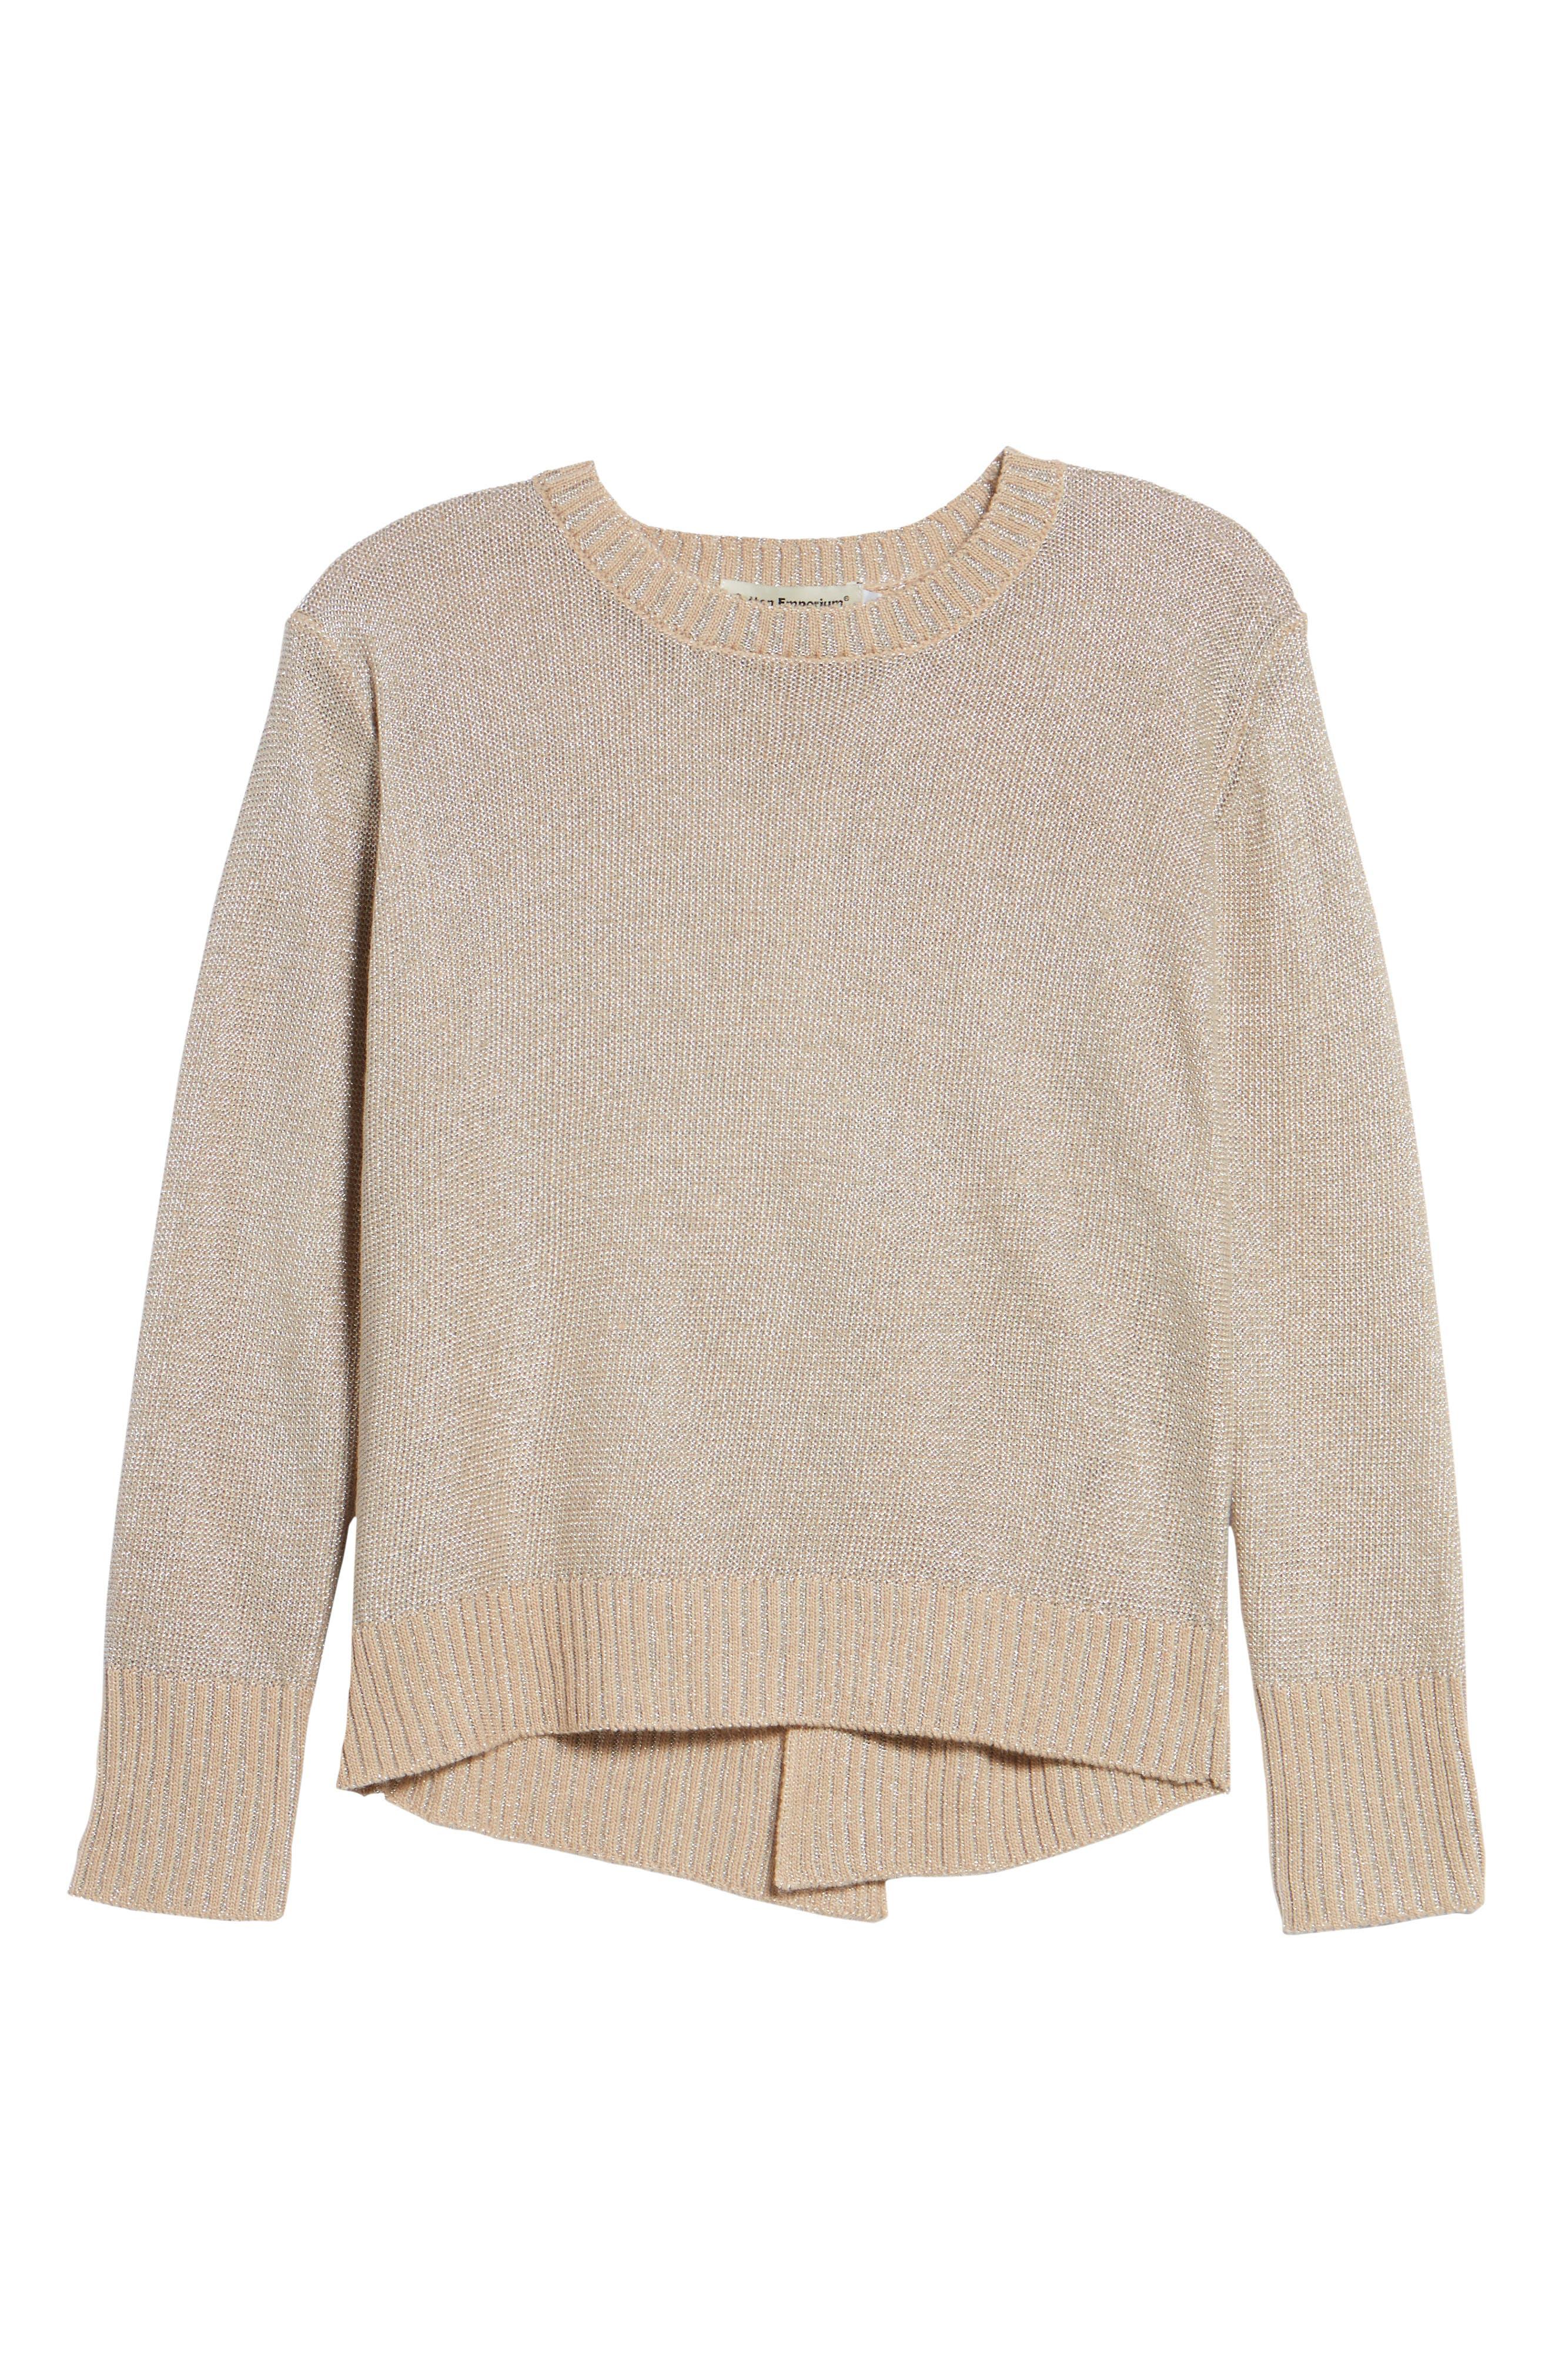 Metallic Flyaway Back Sweater,                             Alternate thumbnail 6, color,                             Taupe/ Silver